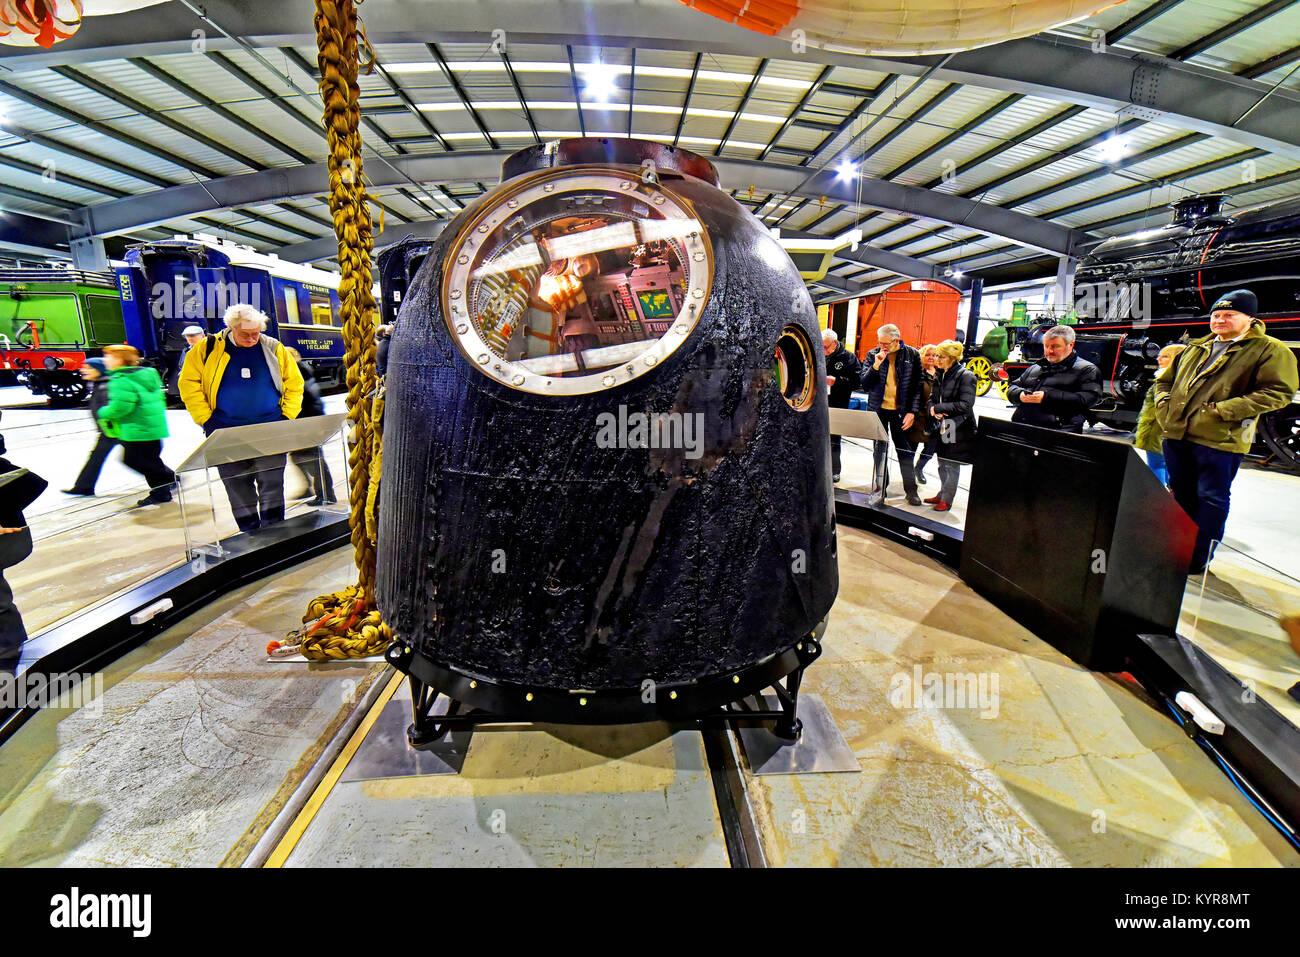 Tim Peakes Soyuz Russian Space Craft capsule Shildon Railway Museum Stock Photo